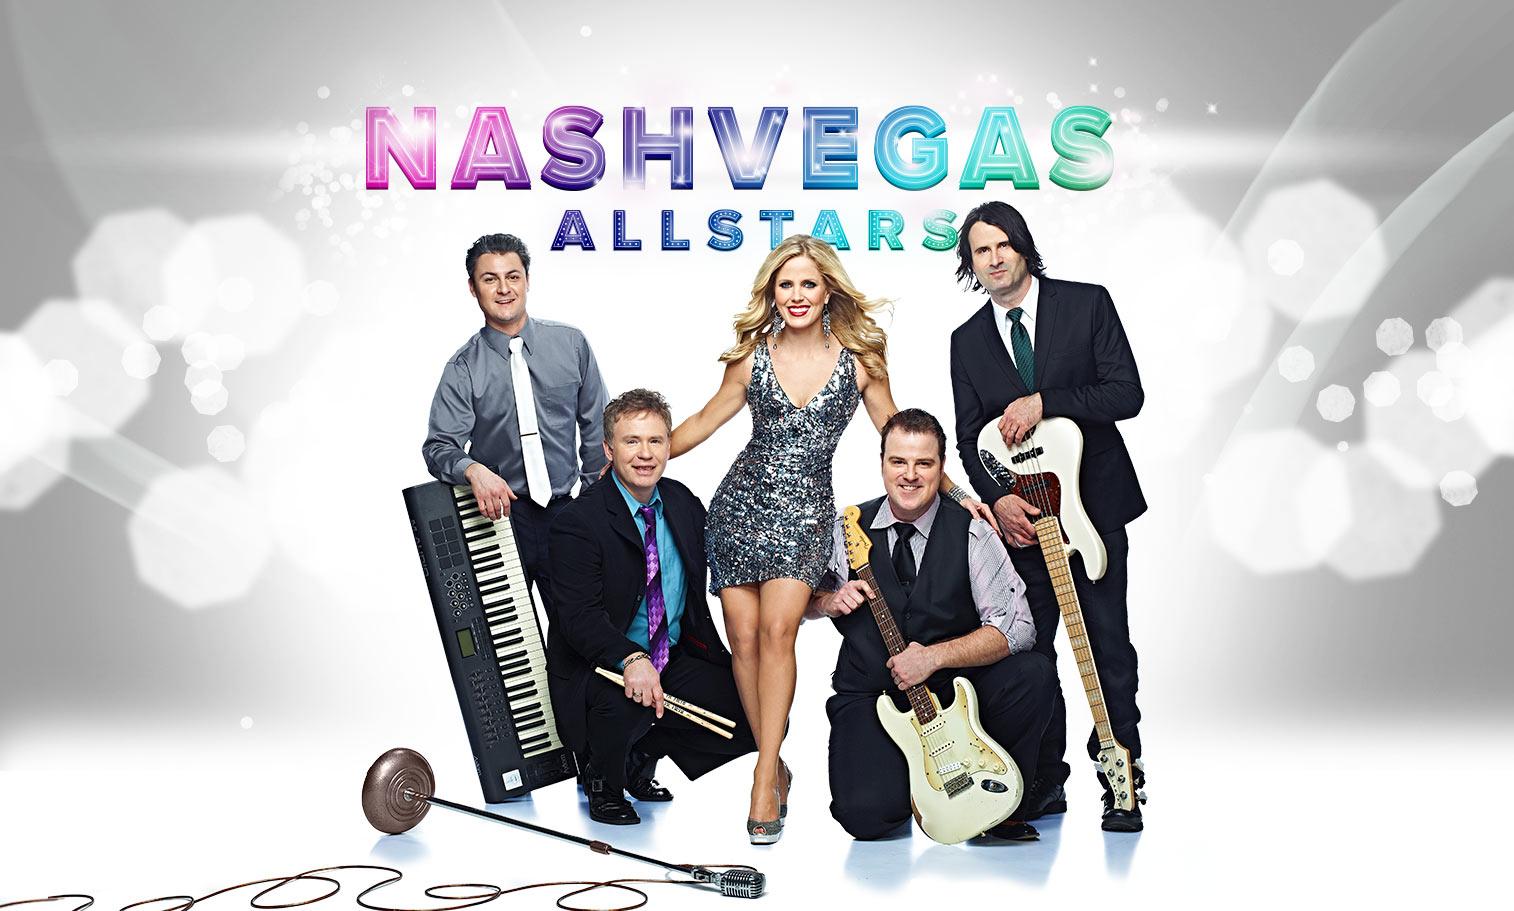 Nash Vegas All Stars Group Photo